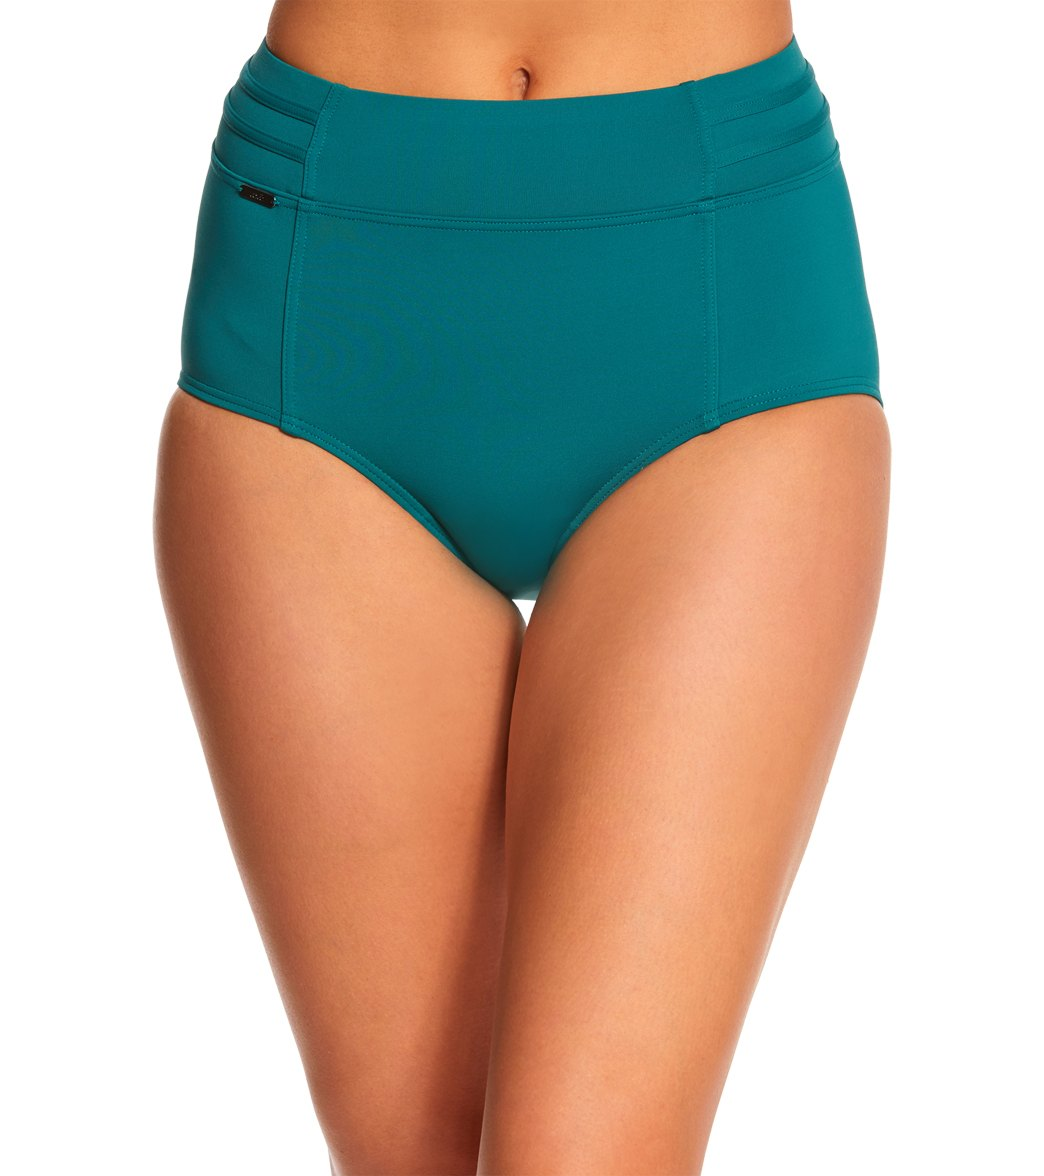 5b0fc4eda26 Lole Matira Solid High Waisted Bikini Bottom at SwimOutlet.com